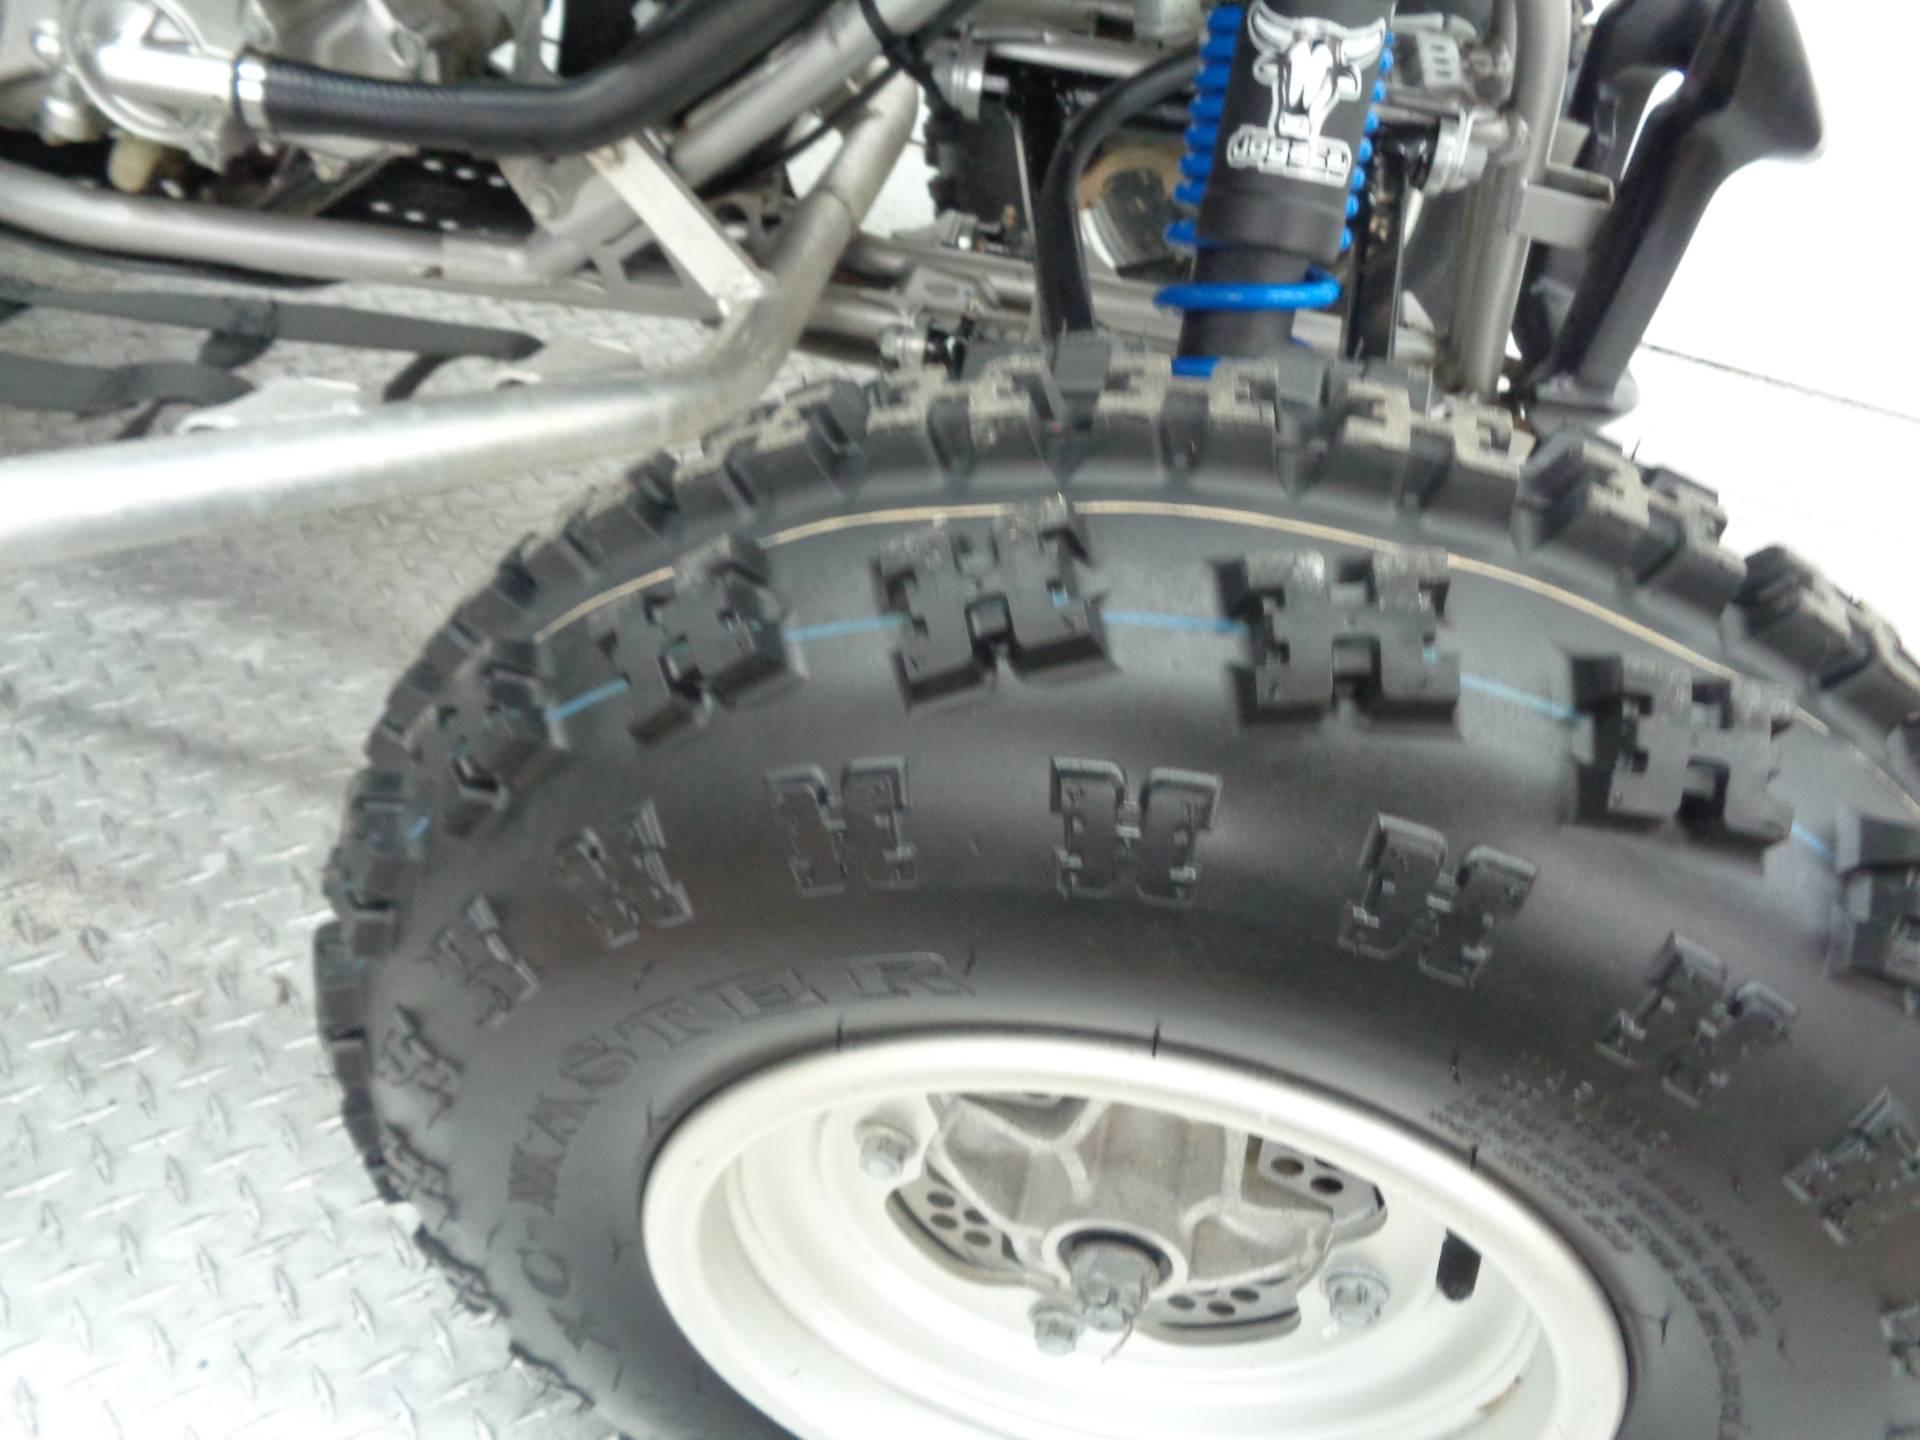 2011 Yamaha Raptor 700R 3